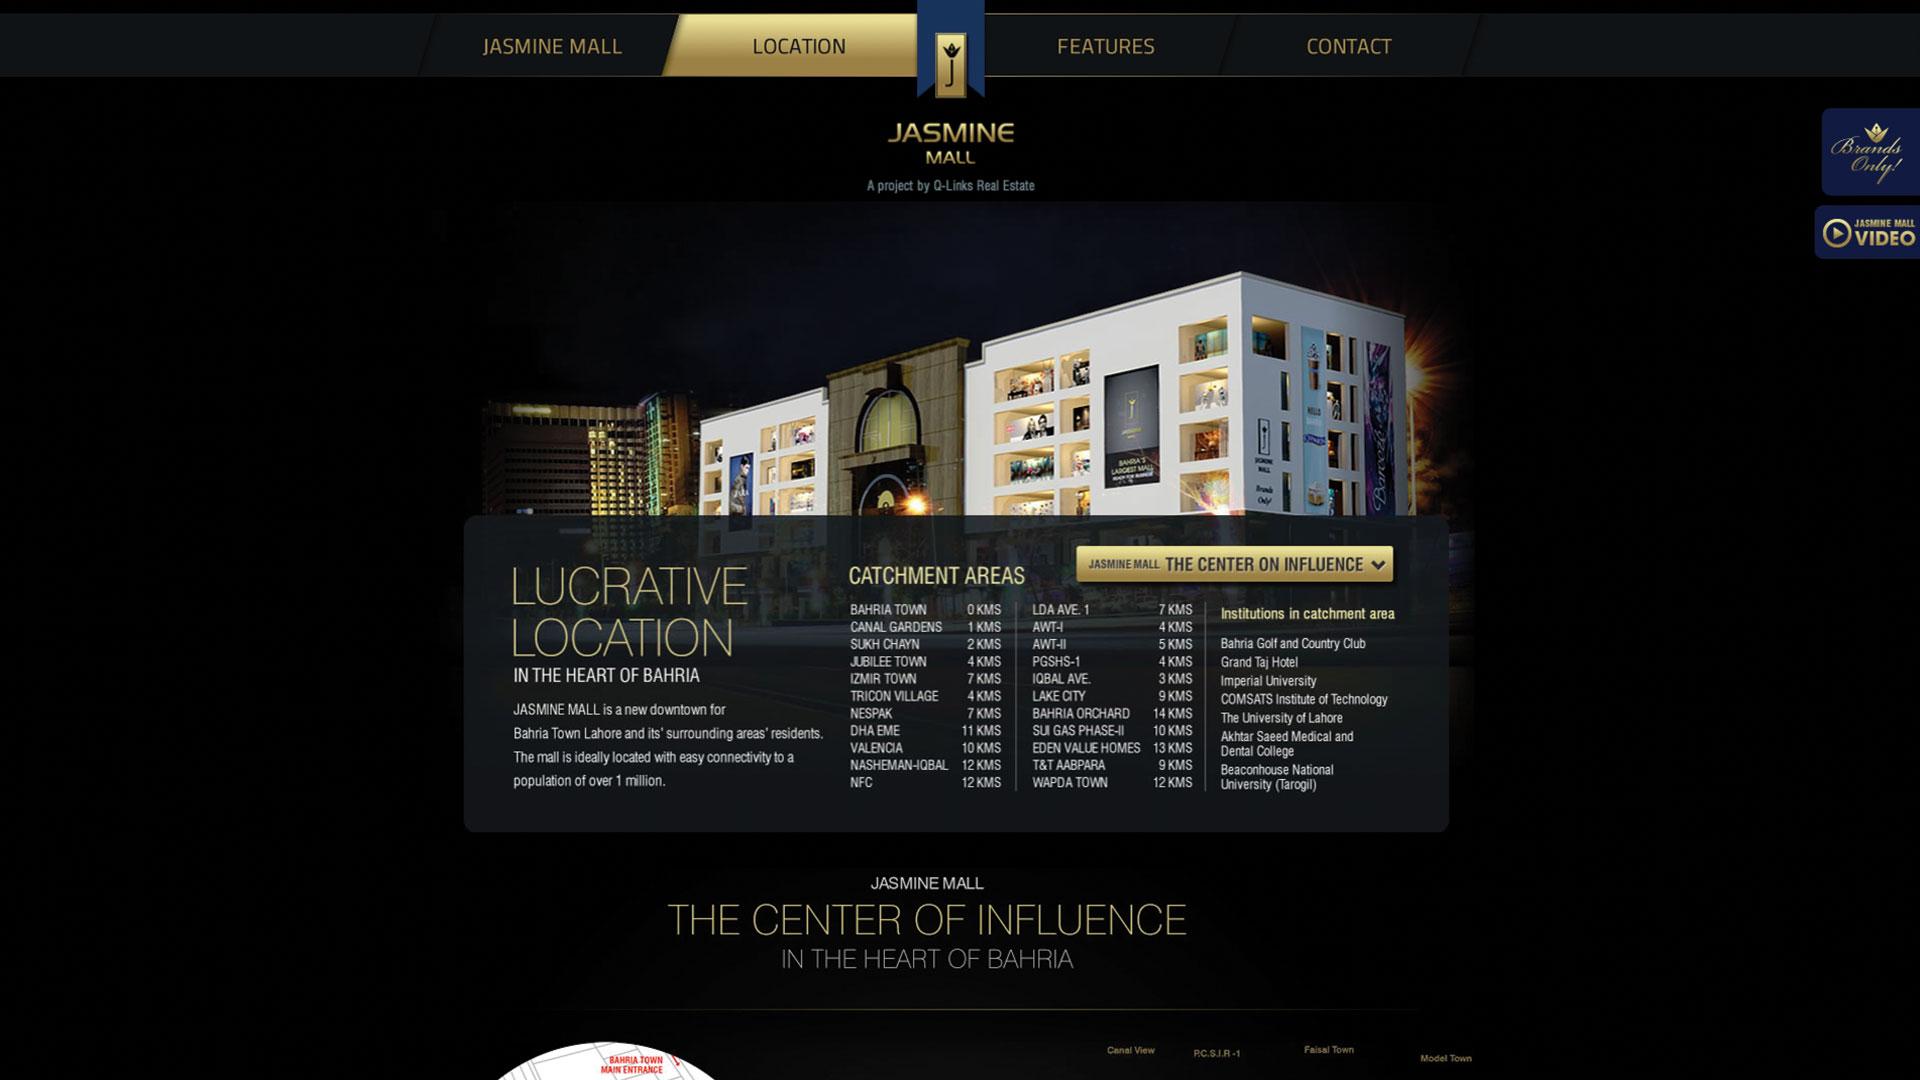 jasmine-mall-Vancouver-web-design-Vancouver-web-development-by-mapleweb-canada-location